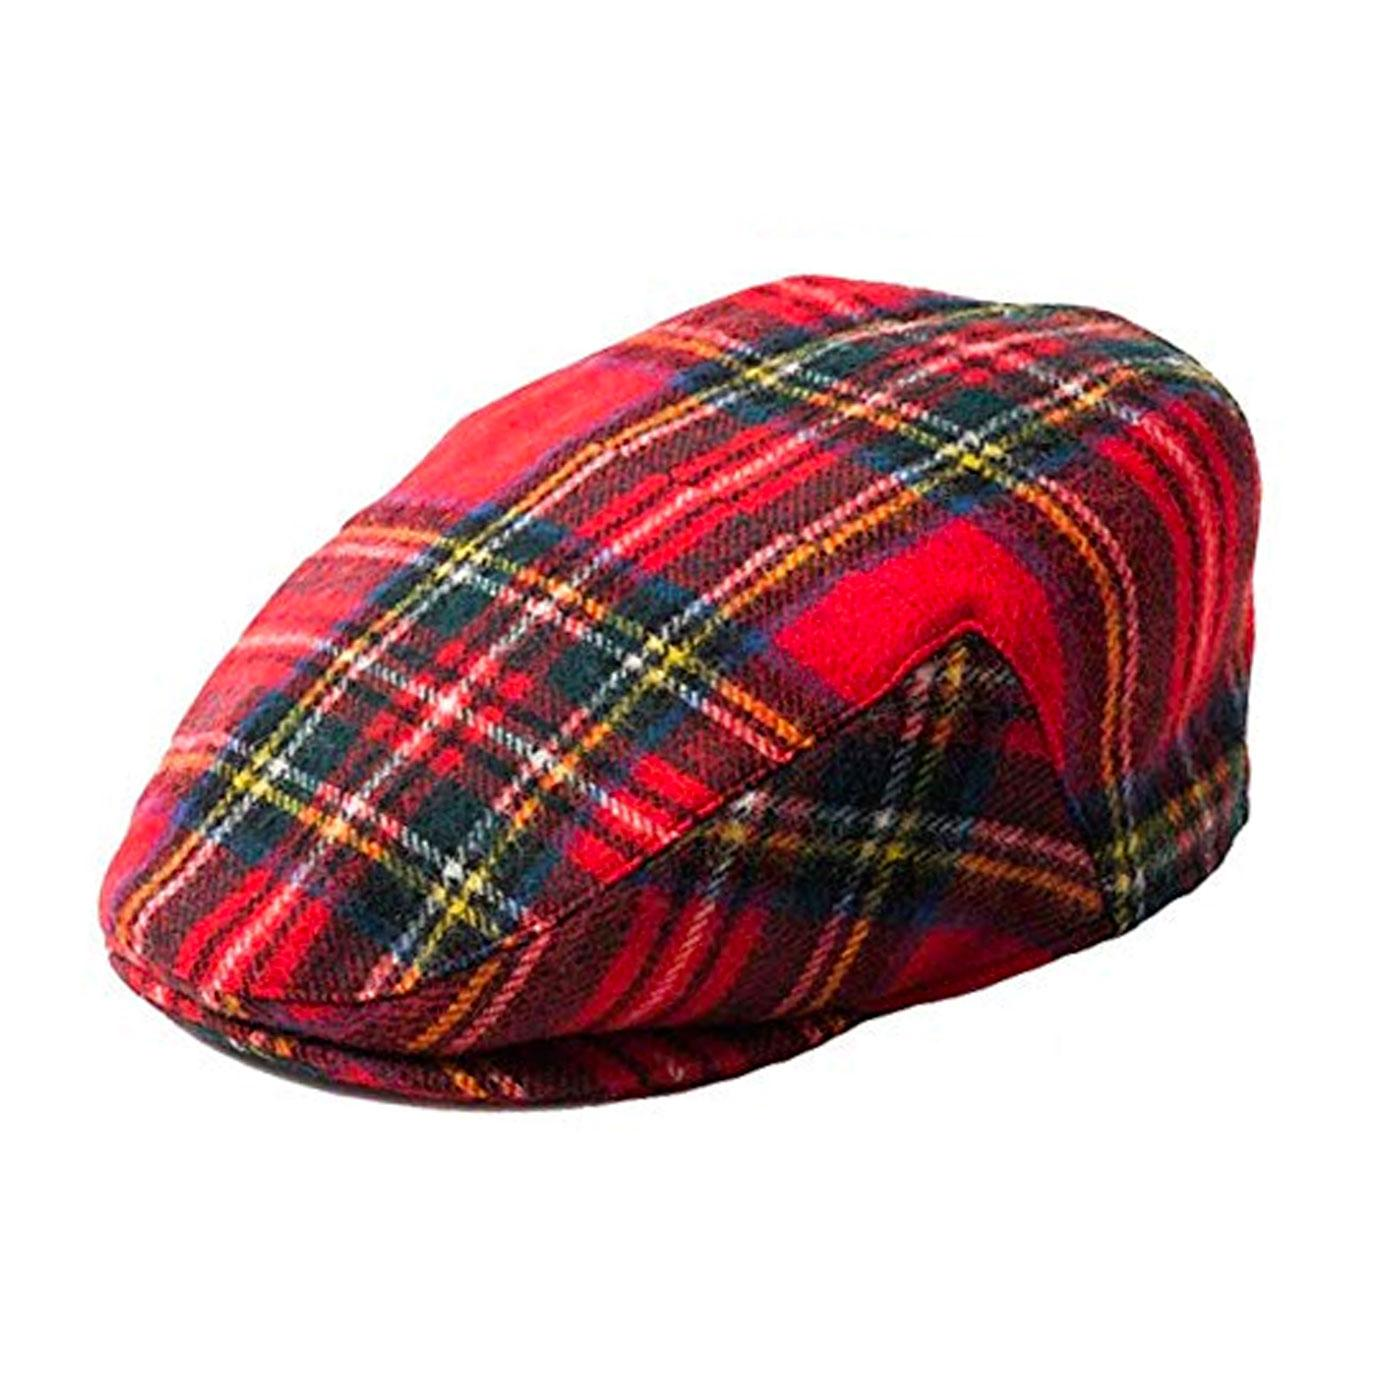 FAILSWORTH Men's Retro Tartan Flat Cap (Red)